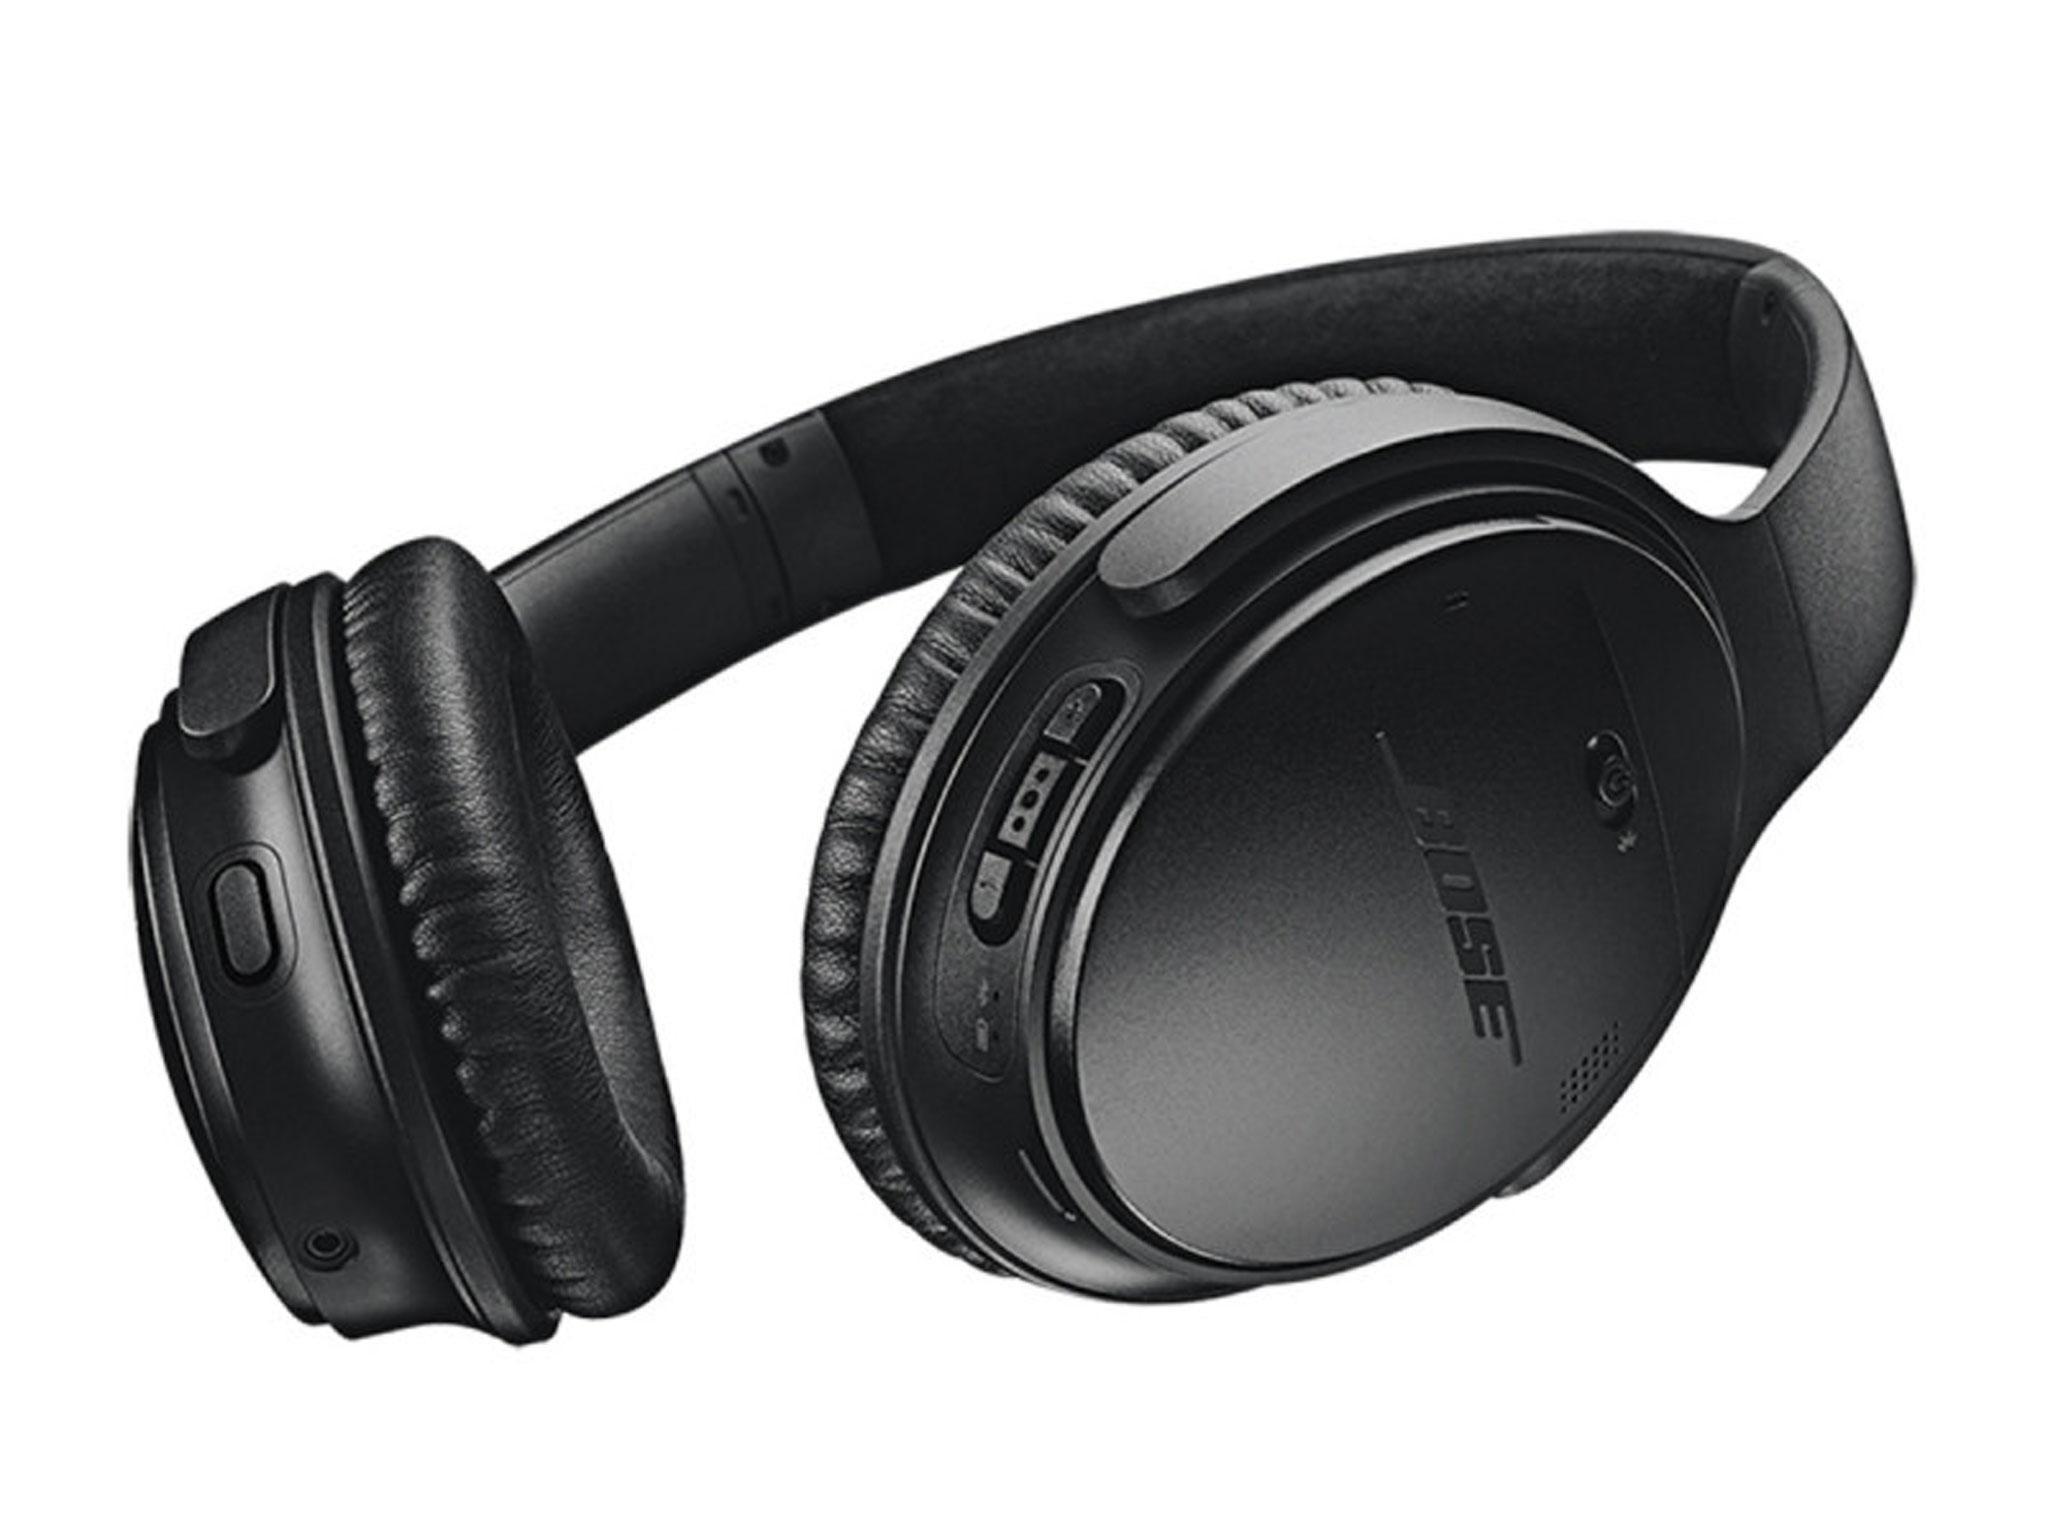 0dbd9708c68 Best headphones deals: The biggest discounts on Bose, Sennheiser ...